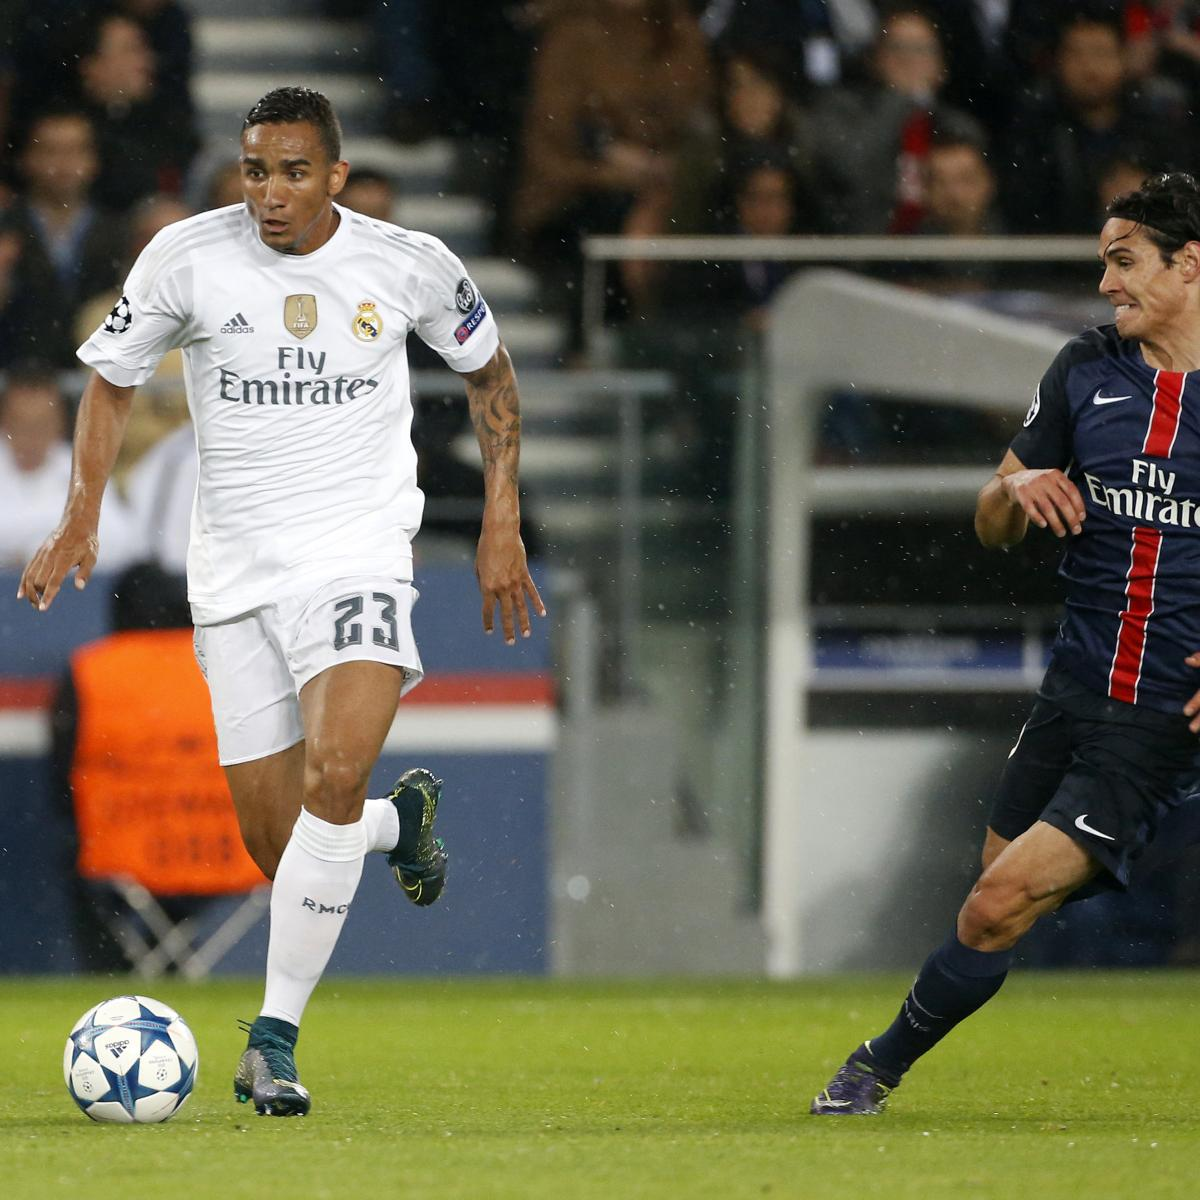 Psg Vs Manchester City Live Score Highlights From: Real Madrid Vs. PSG: Live Score, Highlights From Champions